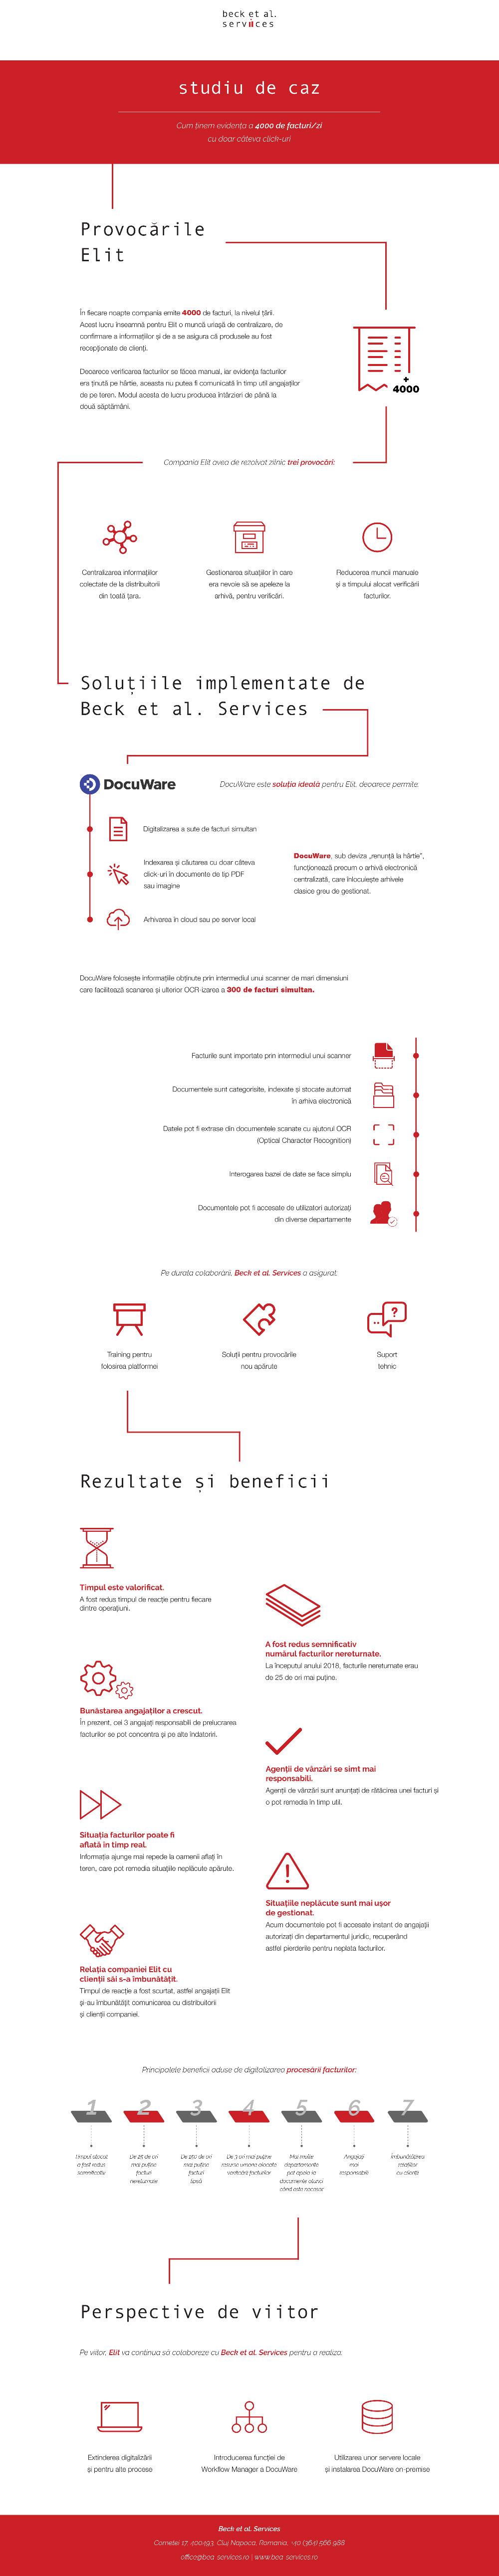 infografic Evidenta facturi elit